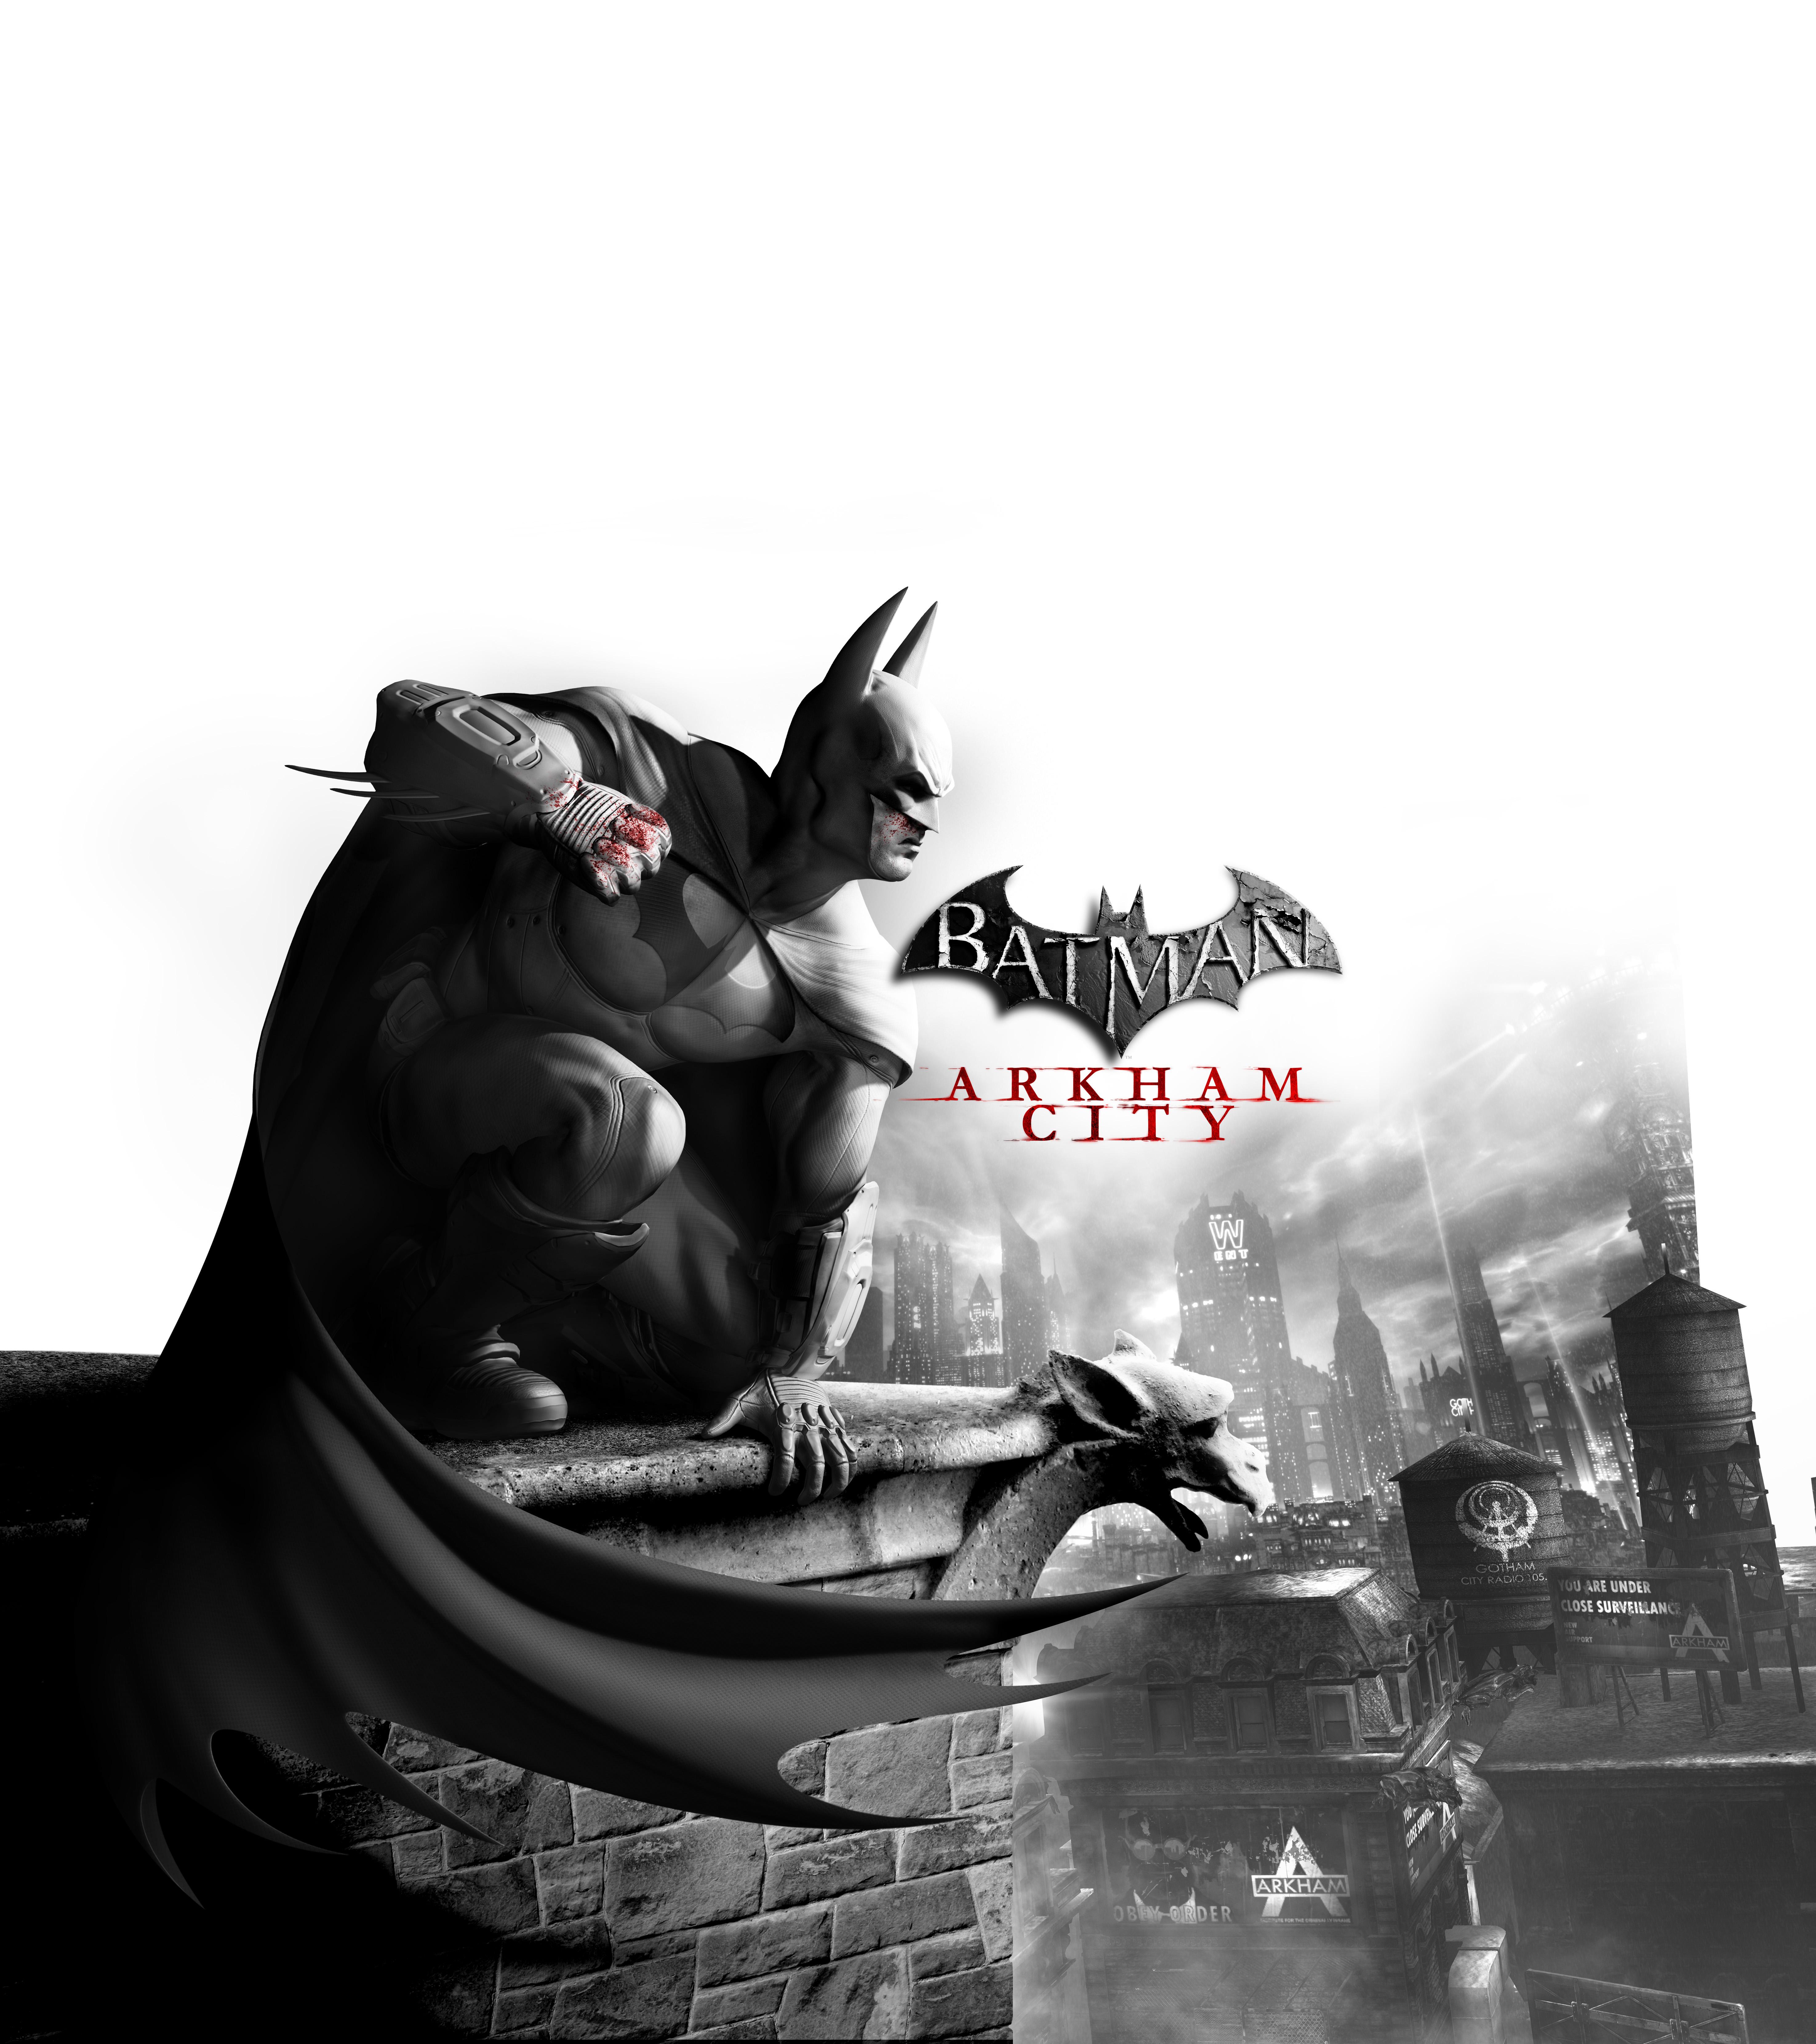 Bat Man  ARKHAM CITY  ((تکی هر عدد3500تومان عمده هرعدد2200تومان(هر5عدد) ))